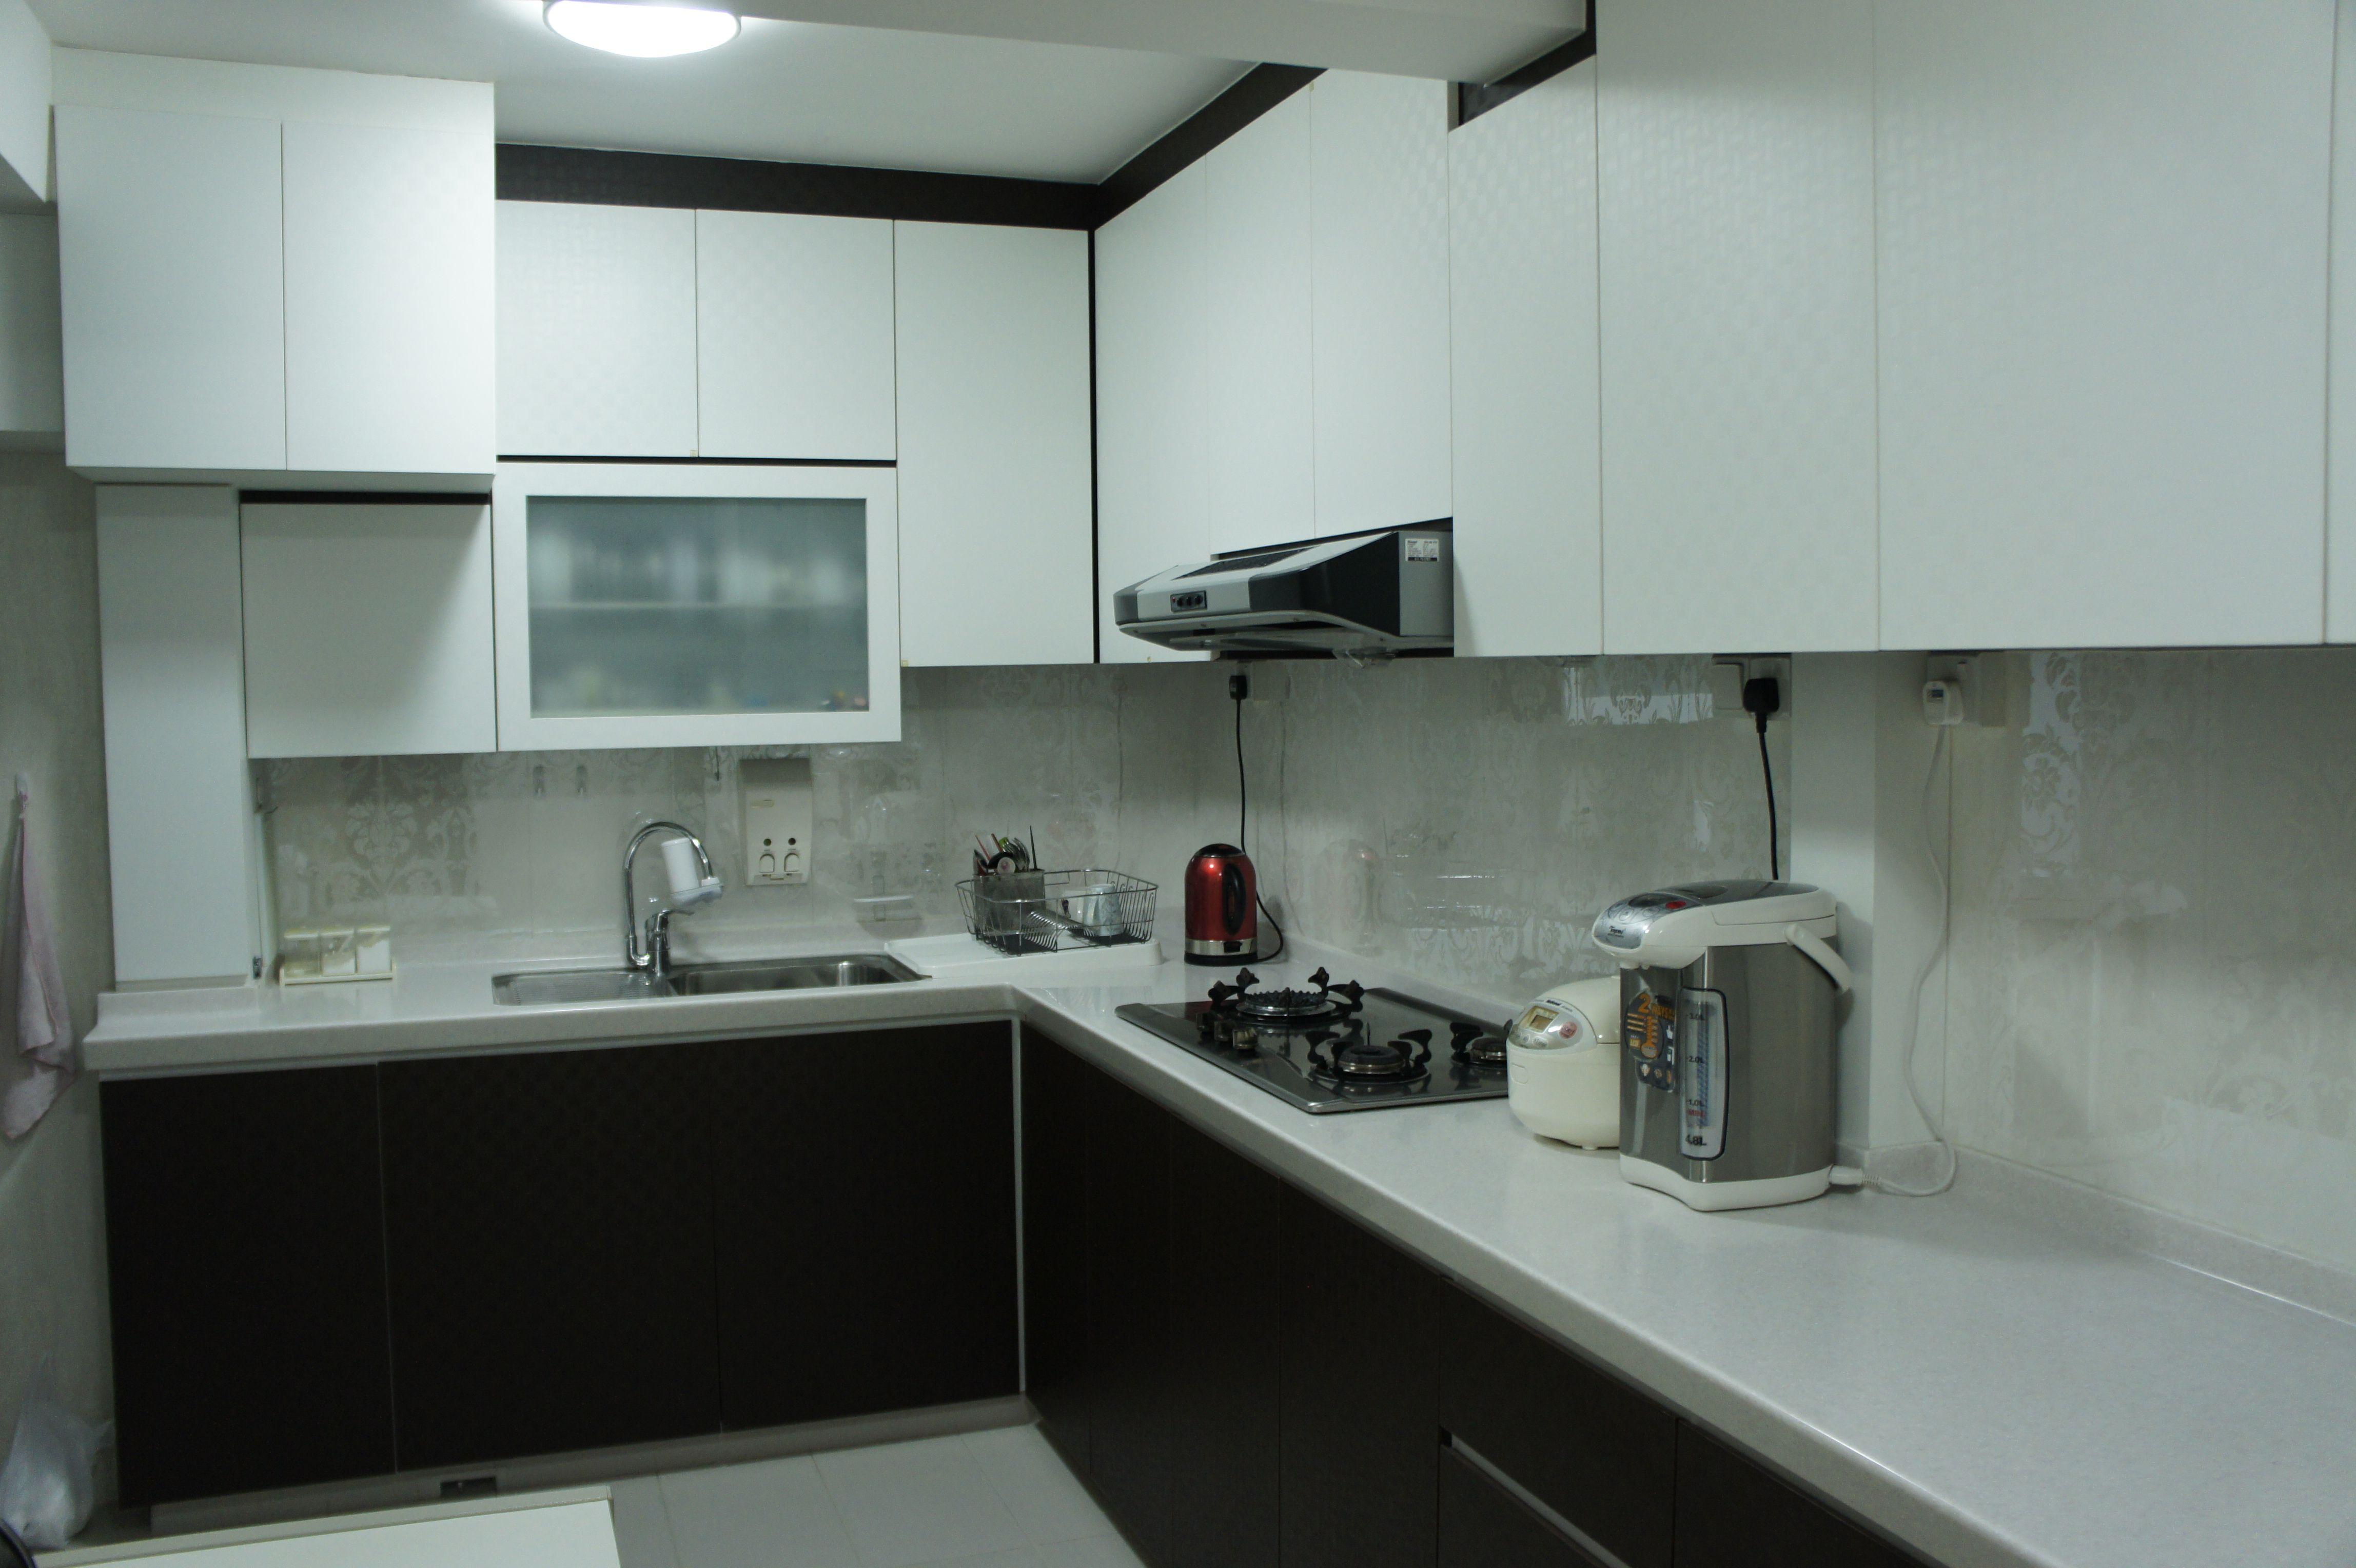 Renovation For Kitchens Hdb 5rm Kitchen Renovation Singapore Hdb Flat Renovations